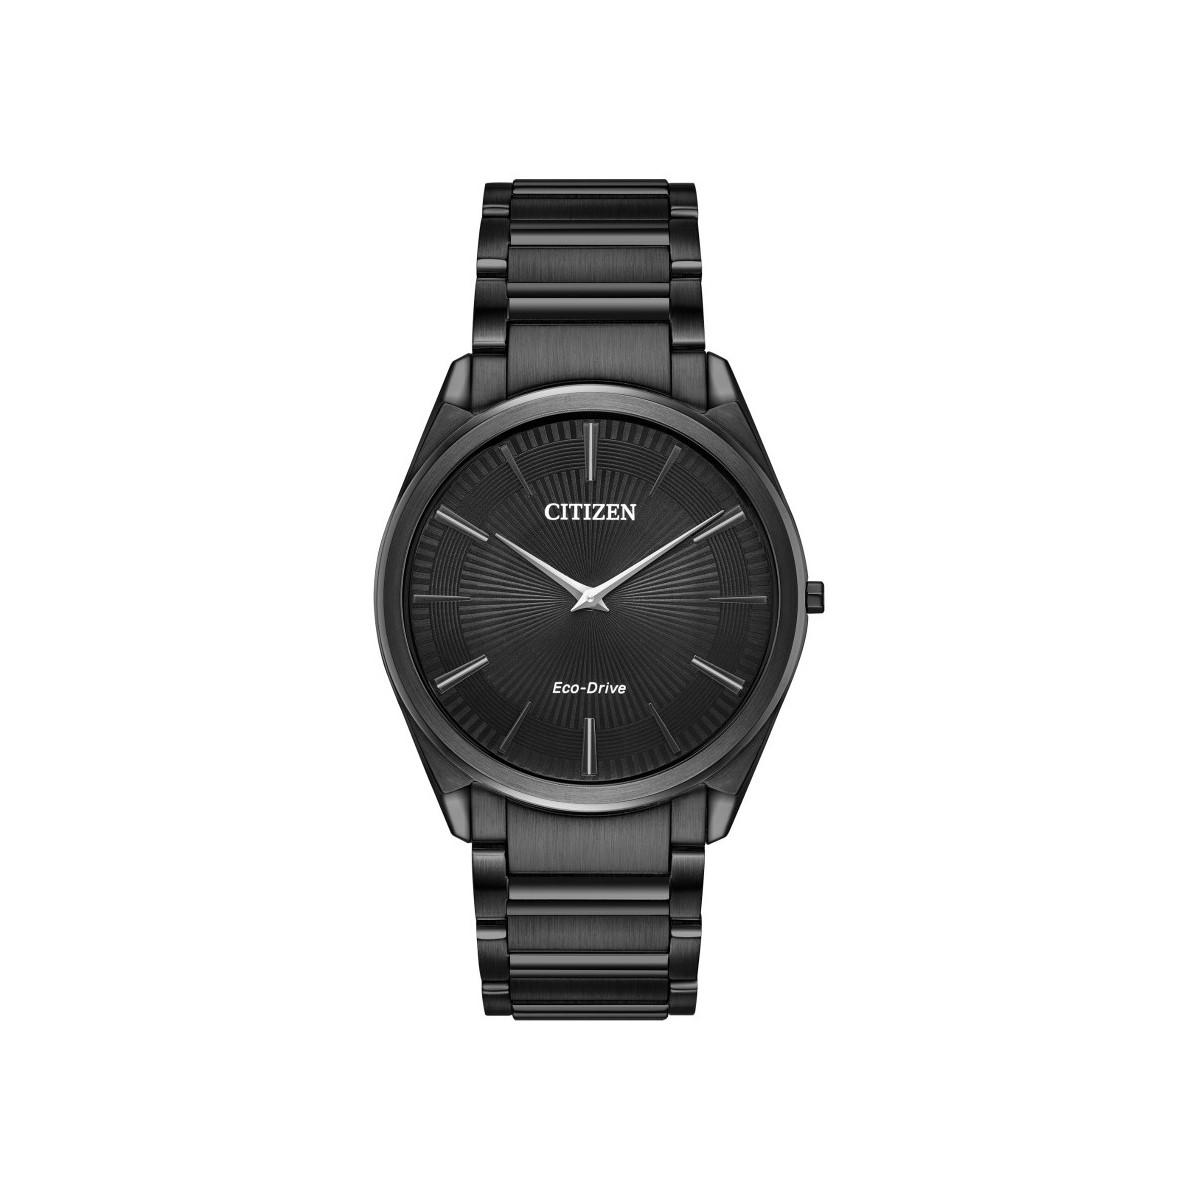 36f4eea7dc4e Citizen Stiletto Black Ultra-Thin Gents Watch 001-505-00564